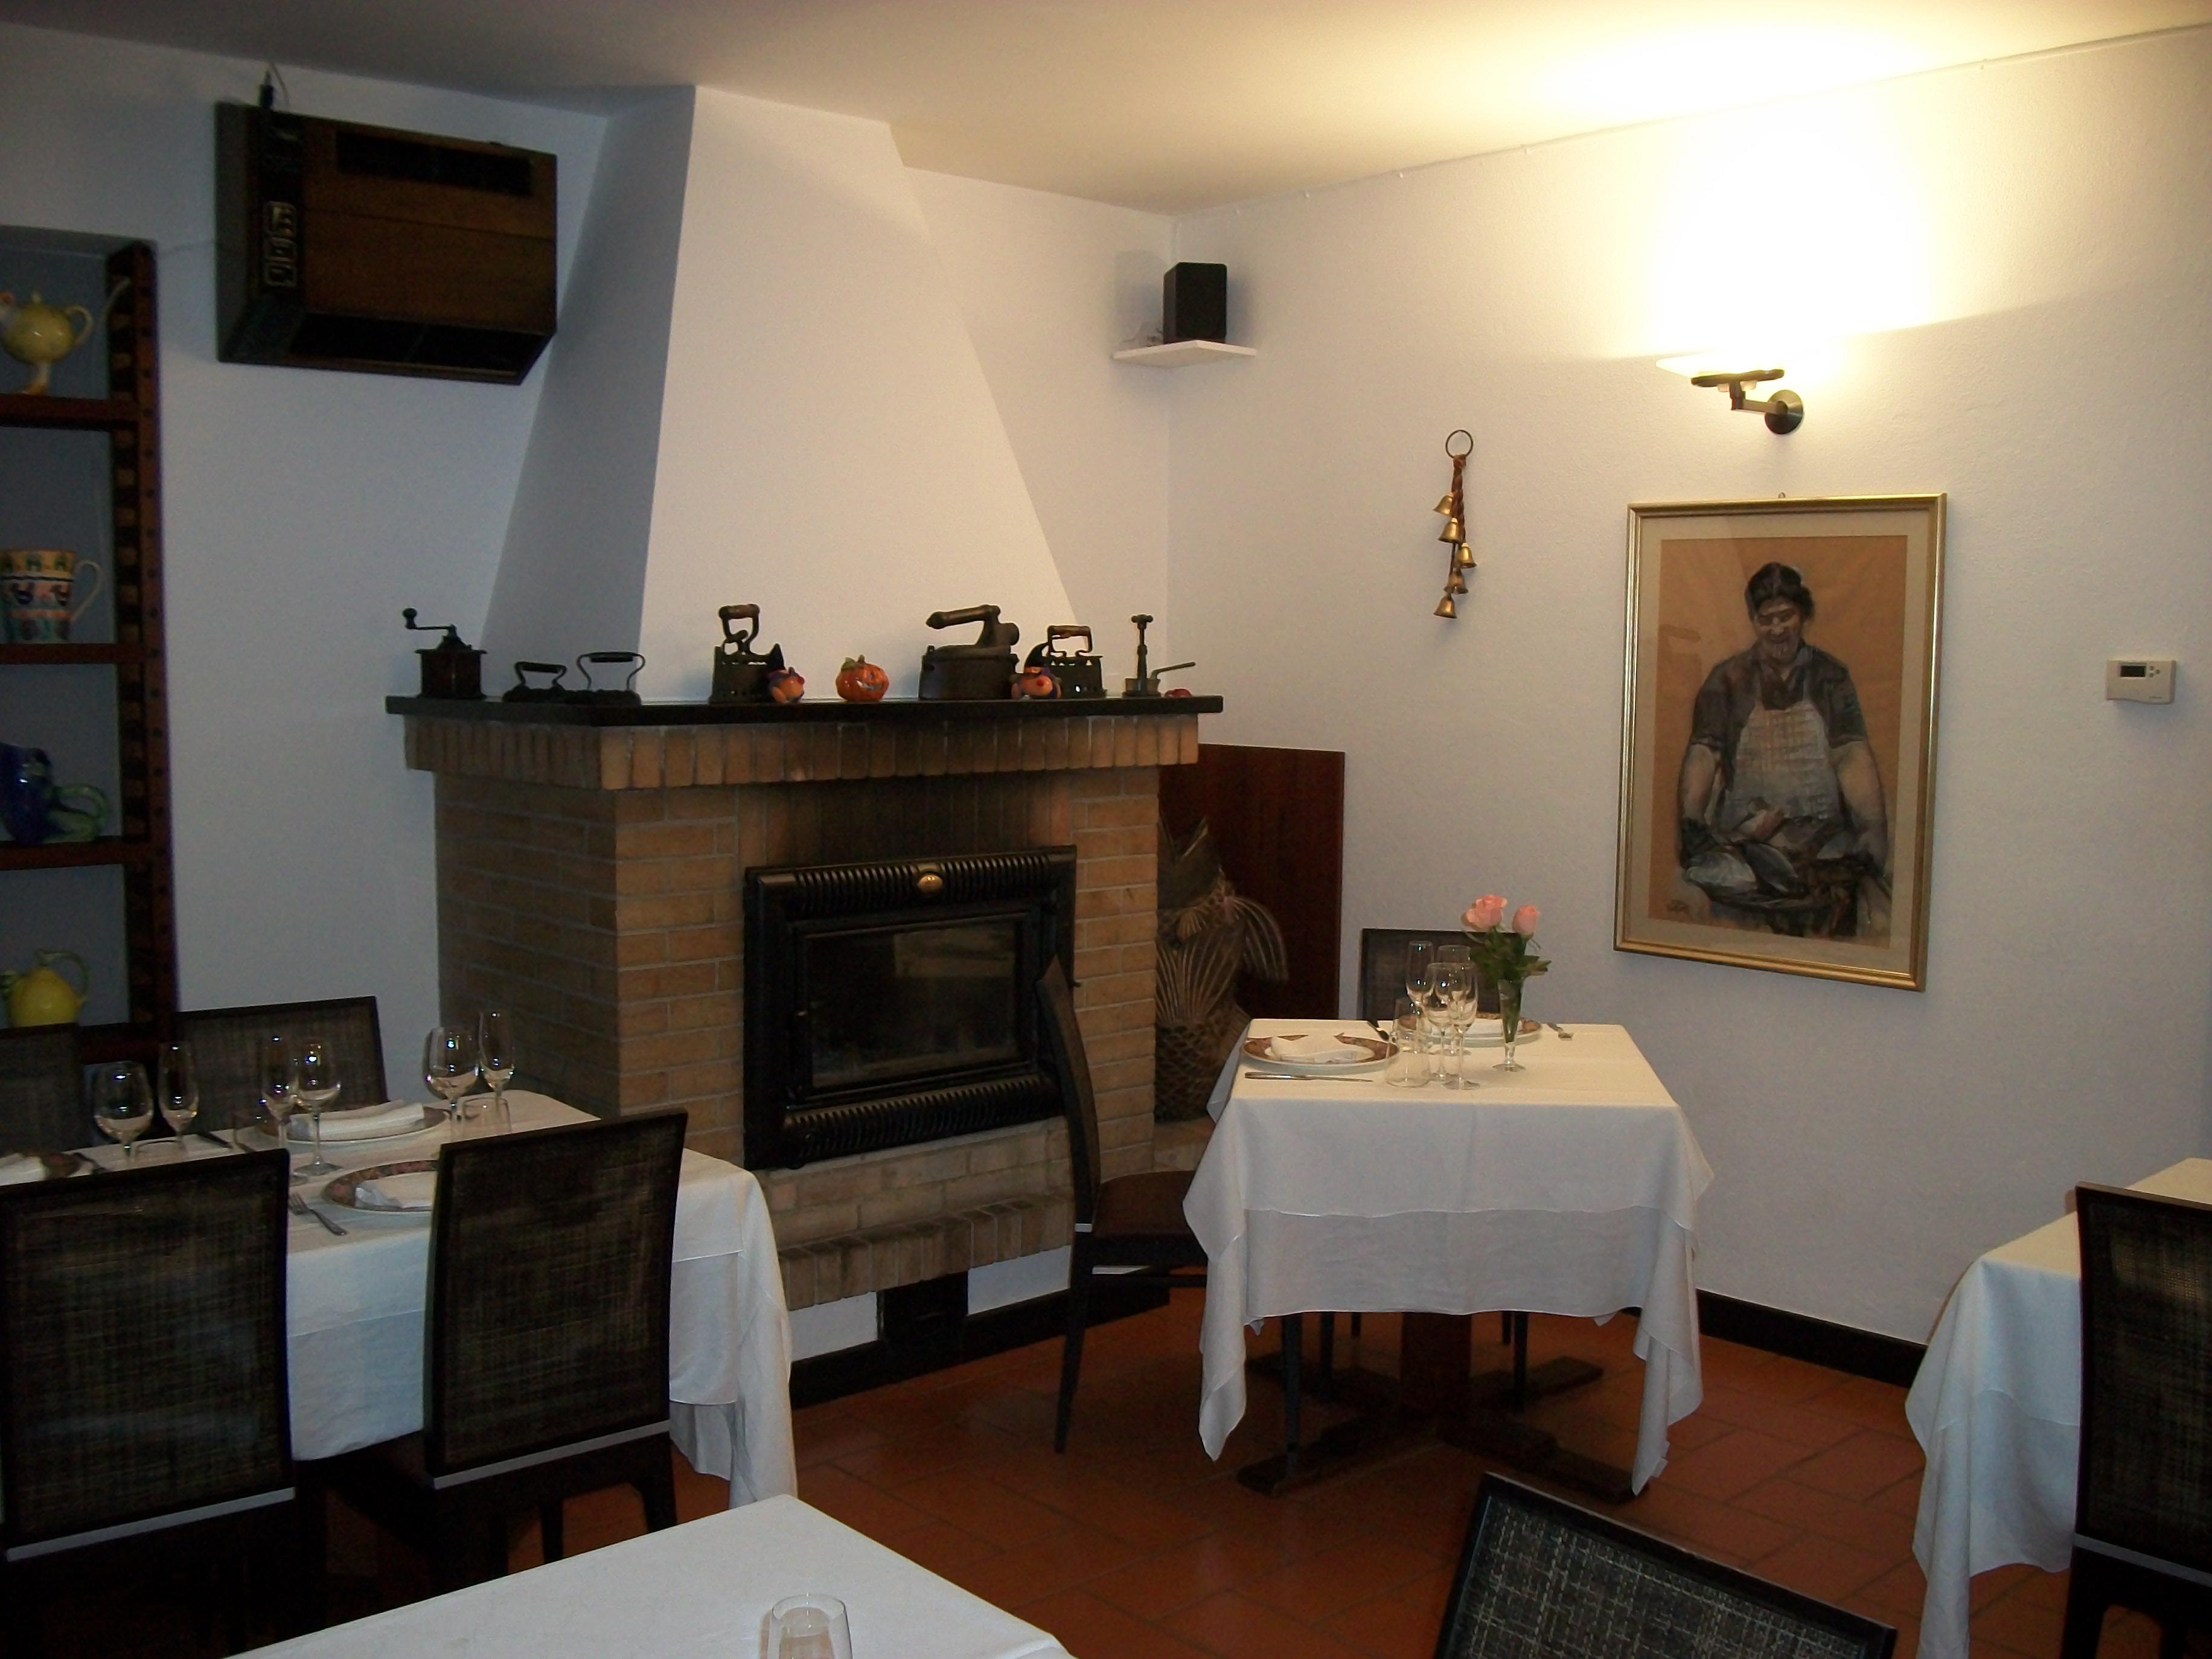 Ristorante San Giovanni:Ristoranti per celiaci a Casarza Ligure